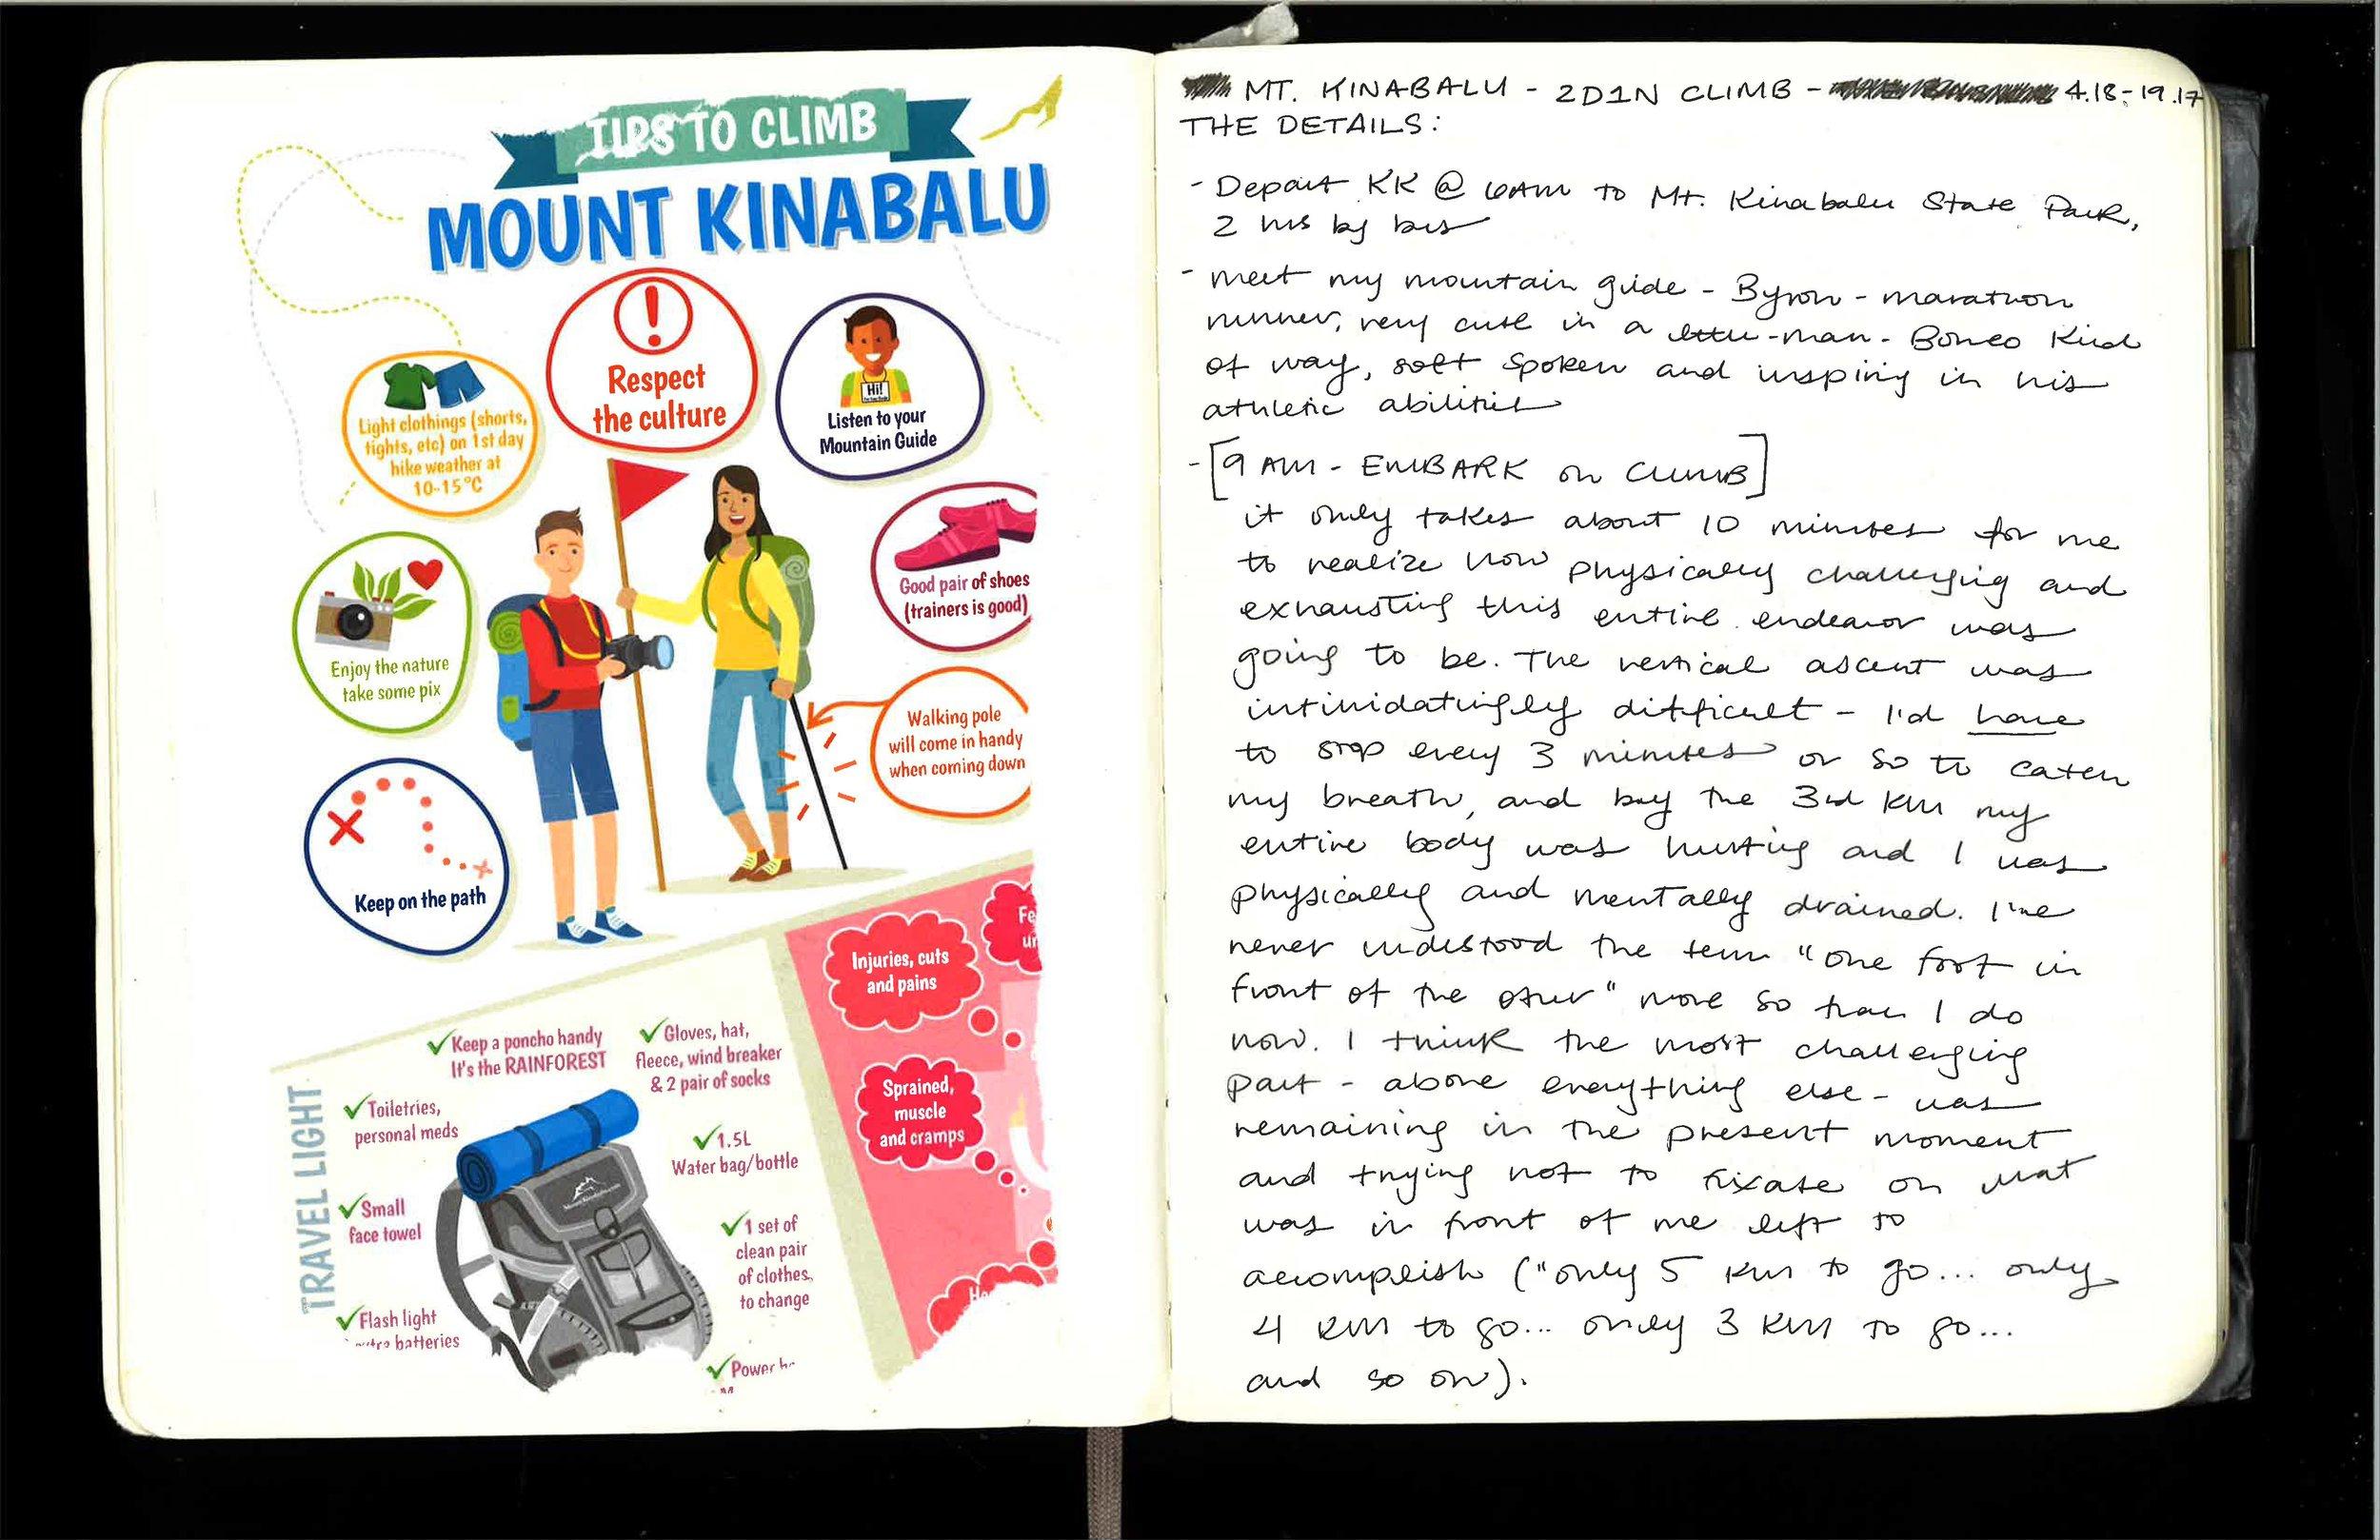 Malaysian Borneo_Page_11.jpg